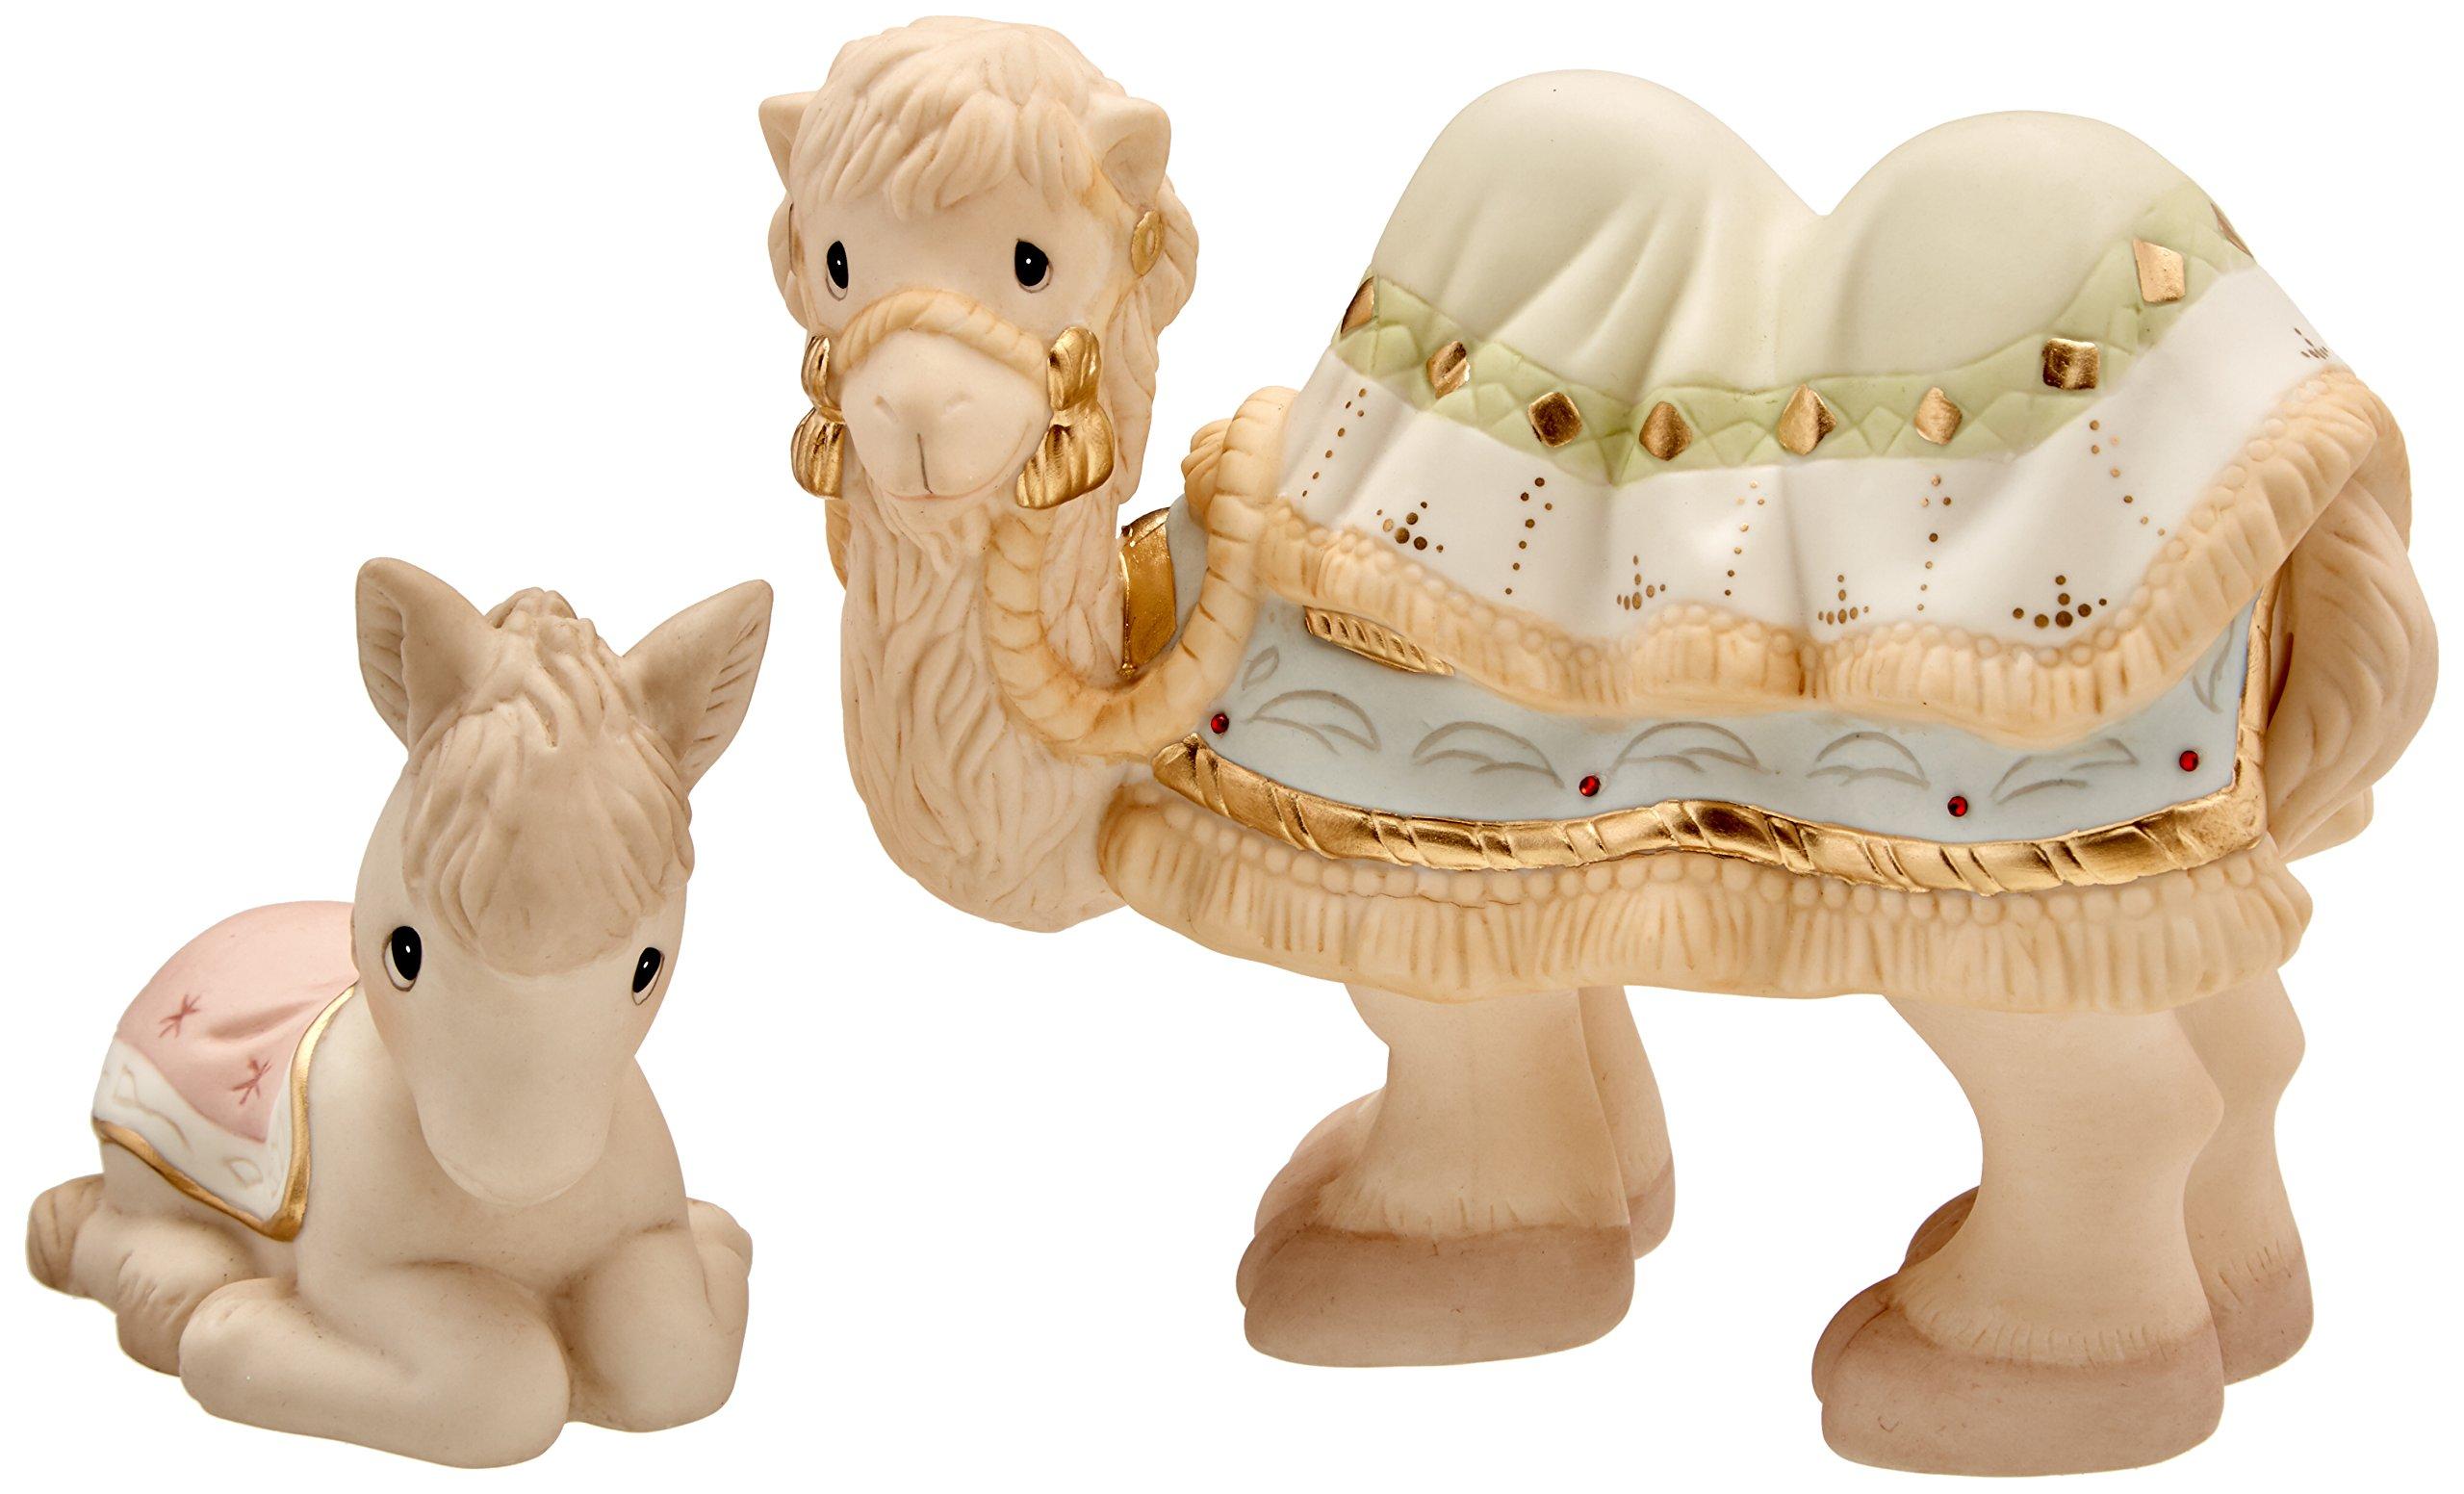 Precious Moments 159028 2 Piece Come Let Us Adore Him Nativity Camel & Donkey Bisque Porcelain Figurine Set